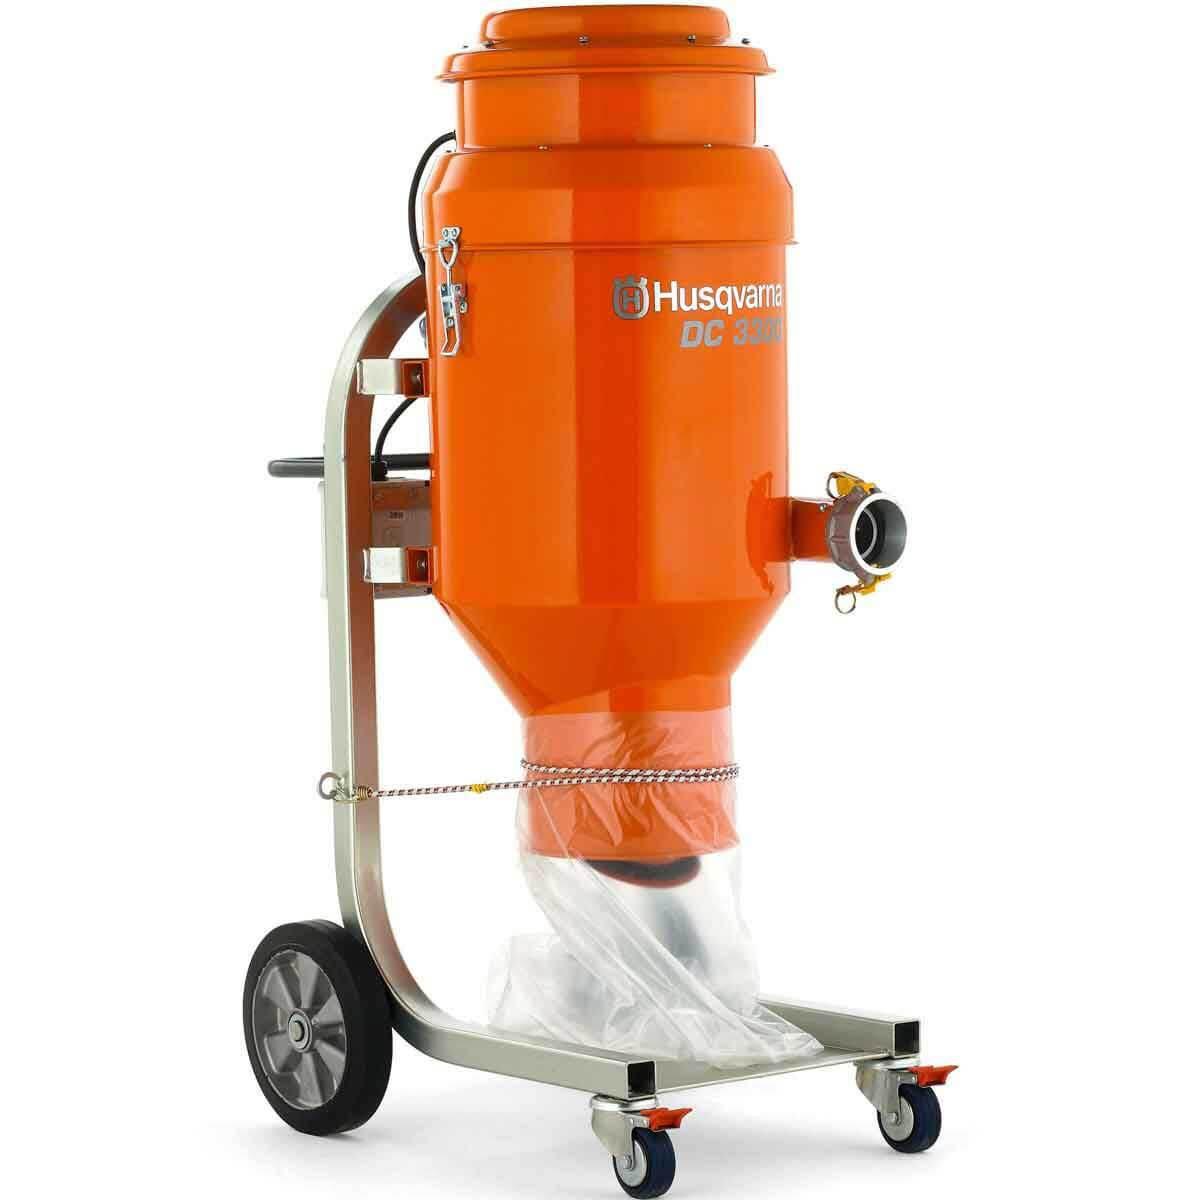 965196015 Husqvarna DC 3300 Wet/Dry Vacuum